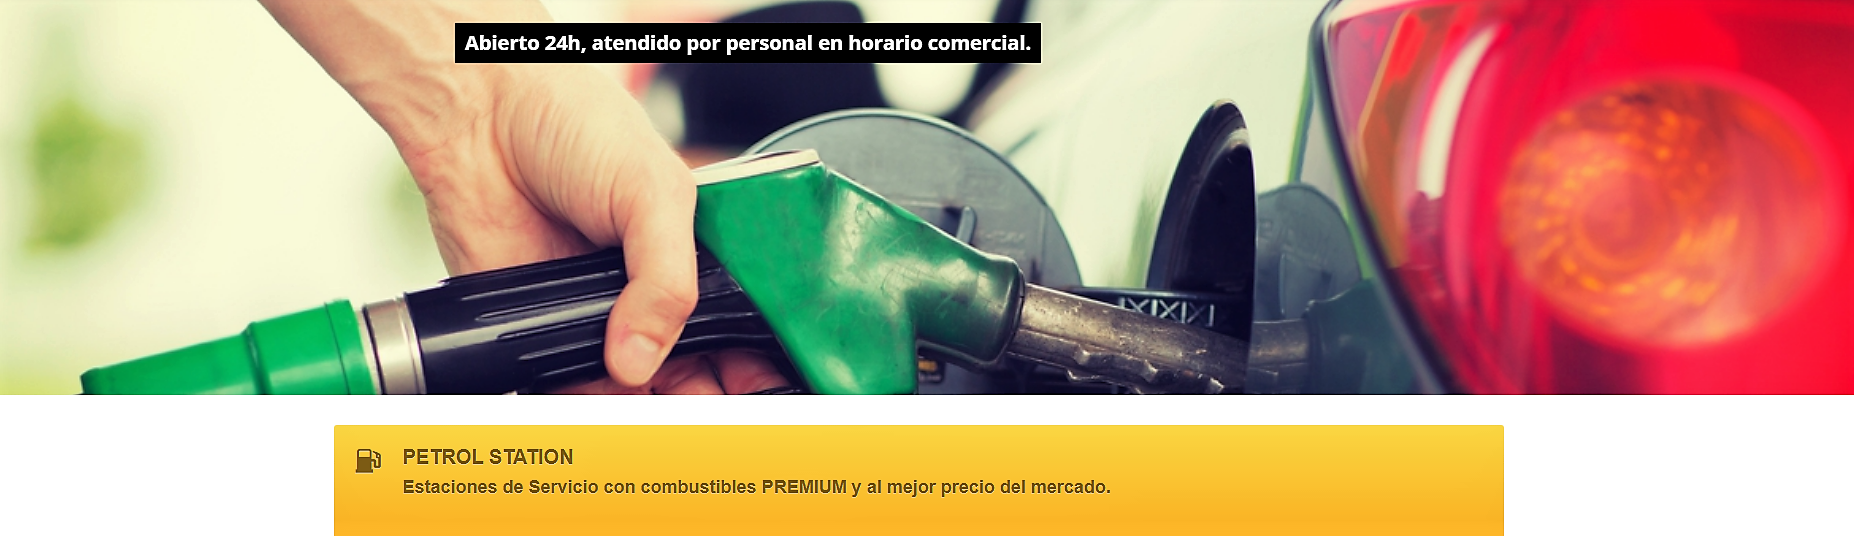 españa petrol station gasolineraespaña petrol station gasolinera